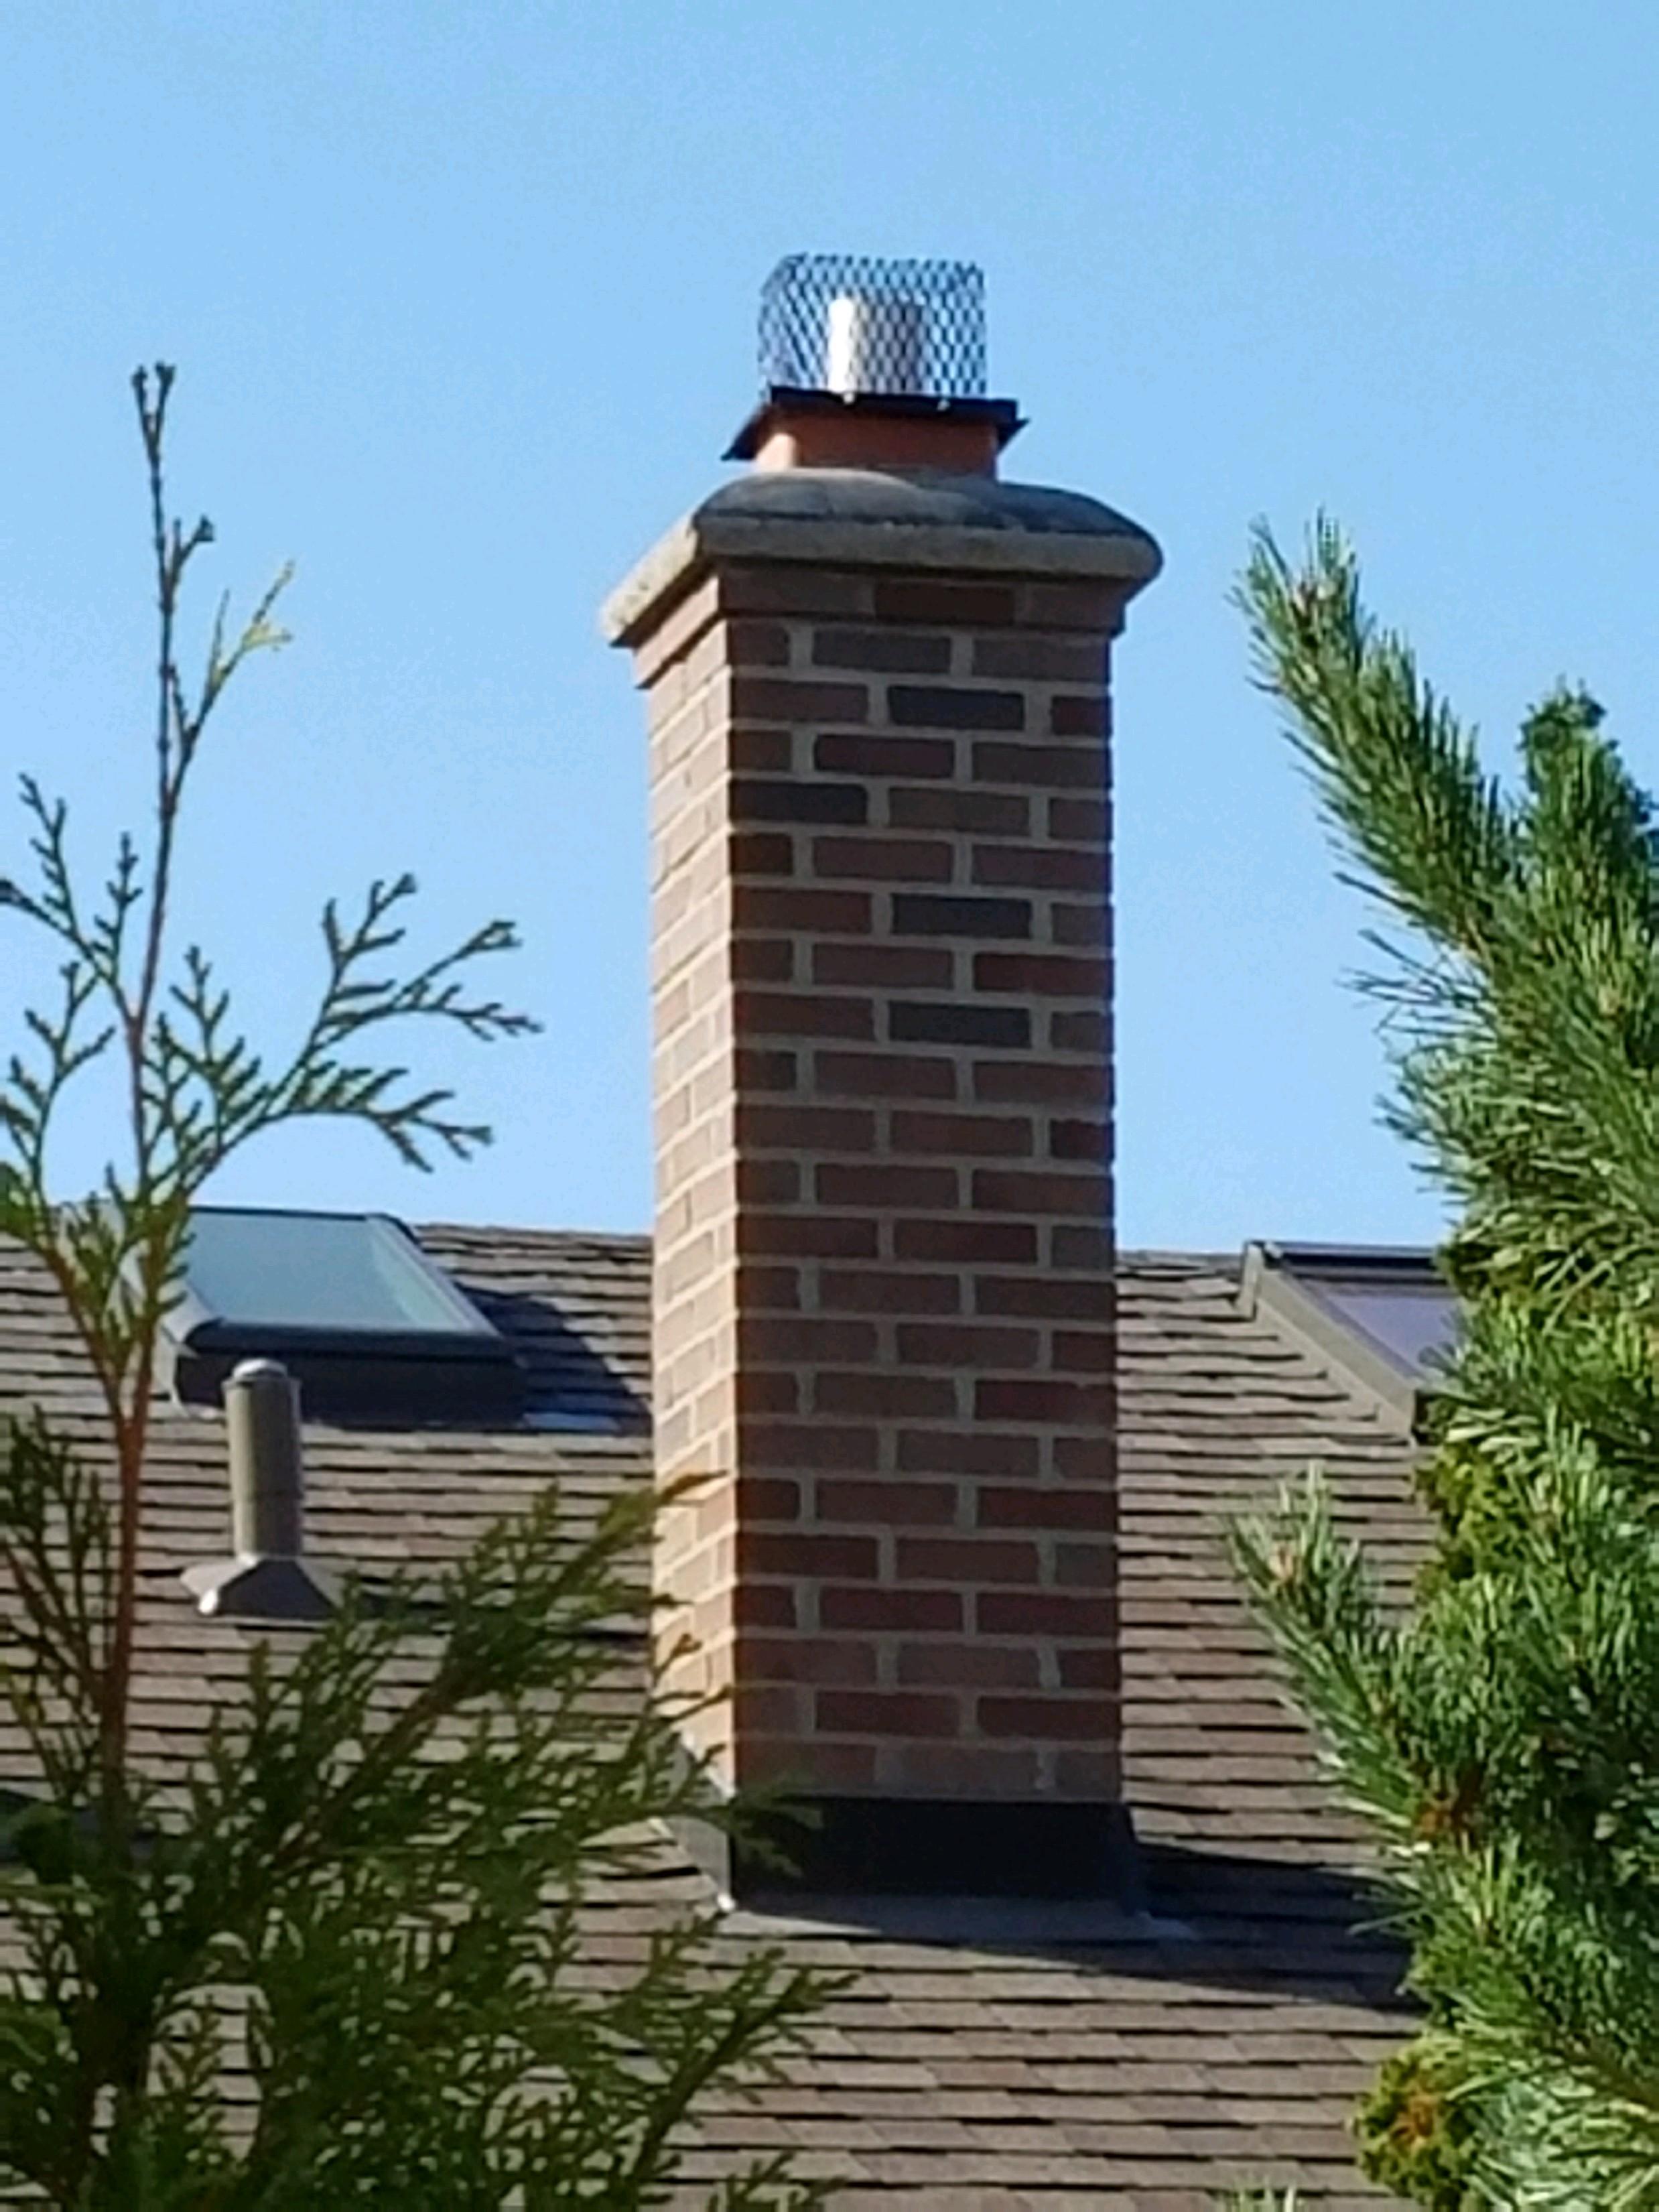 Brick Chimneys (22)